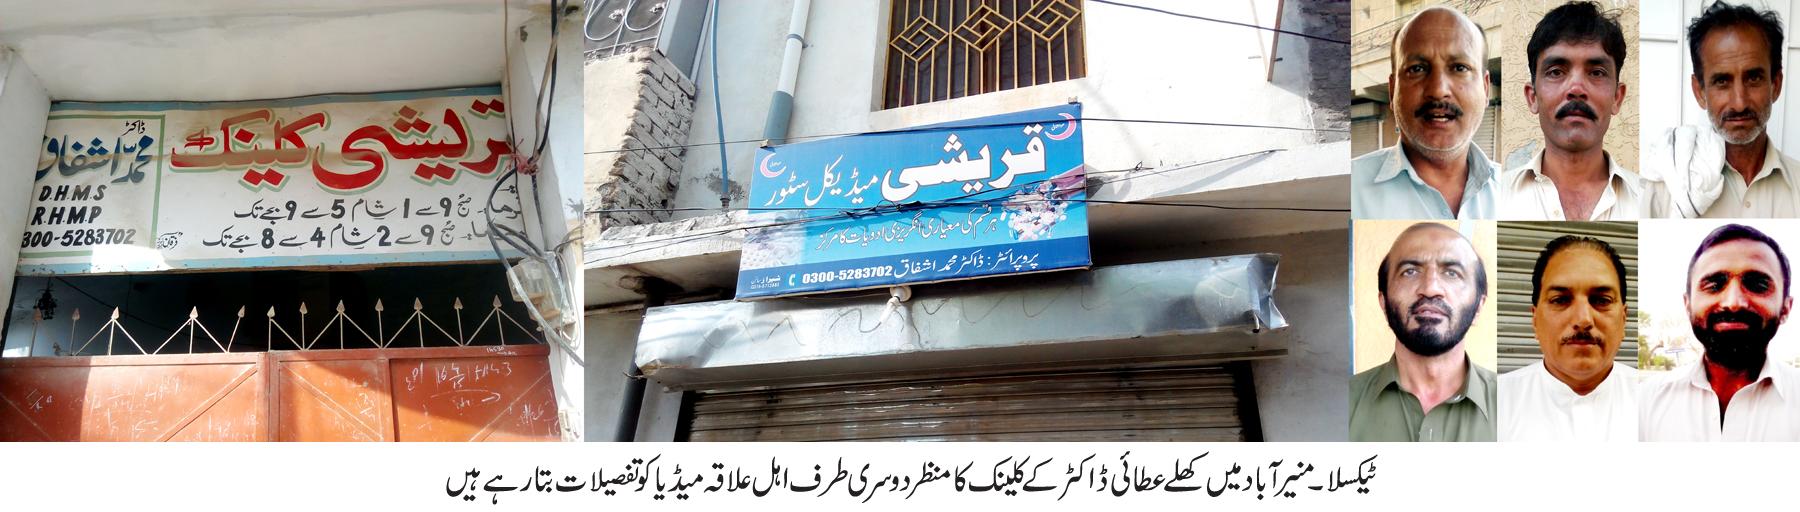 Photo of ٹیکسلا:منیرآباد میں عطائی ڈاکڑز کی بھرمارمحکمہ صحت کے ذمہ داران خواب خرگوش کے مزے لوٹنے لگے